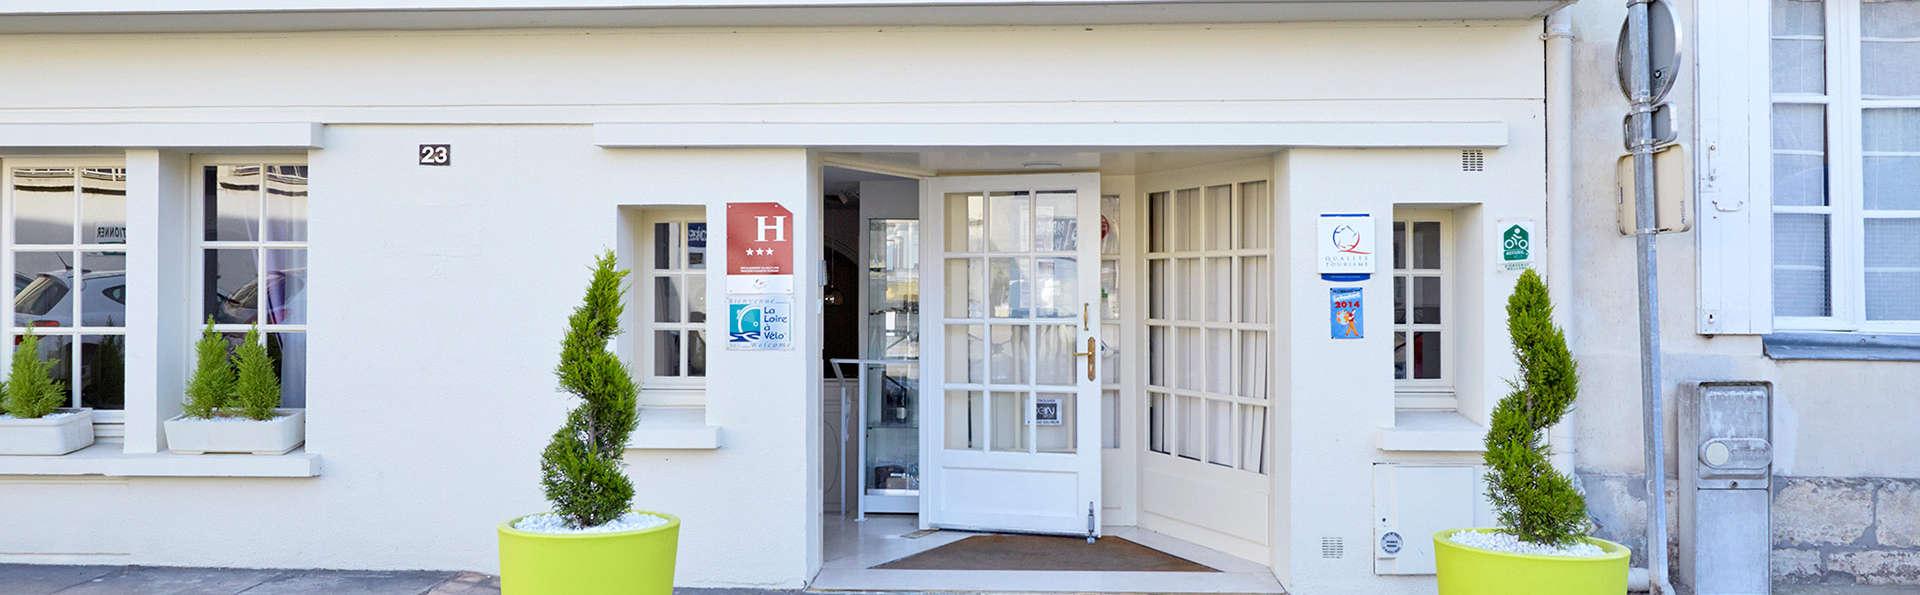 Hôtel Kyriad Saumur - EDIT_front1.jpg